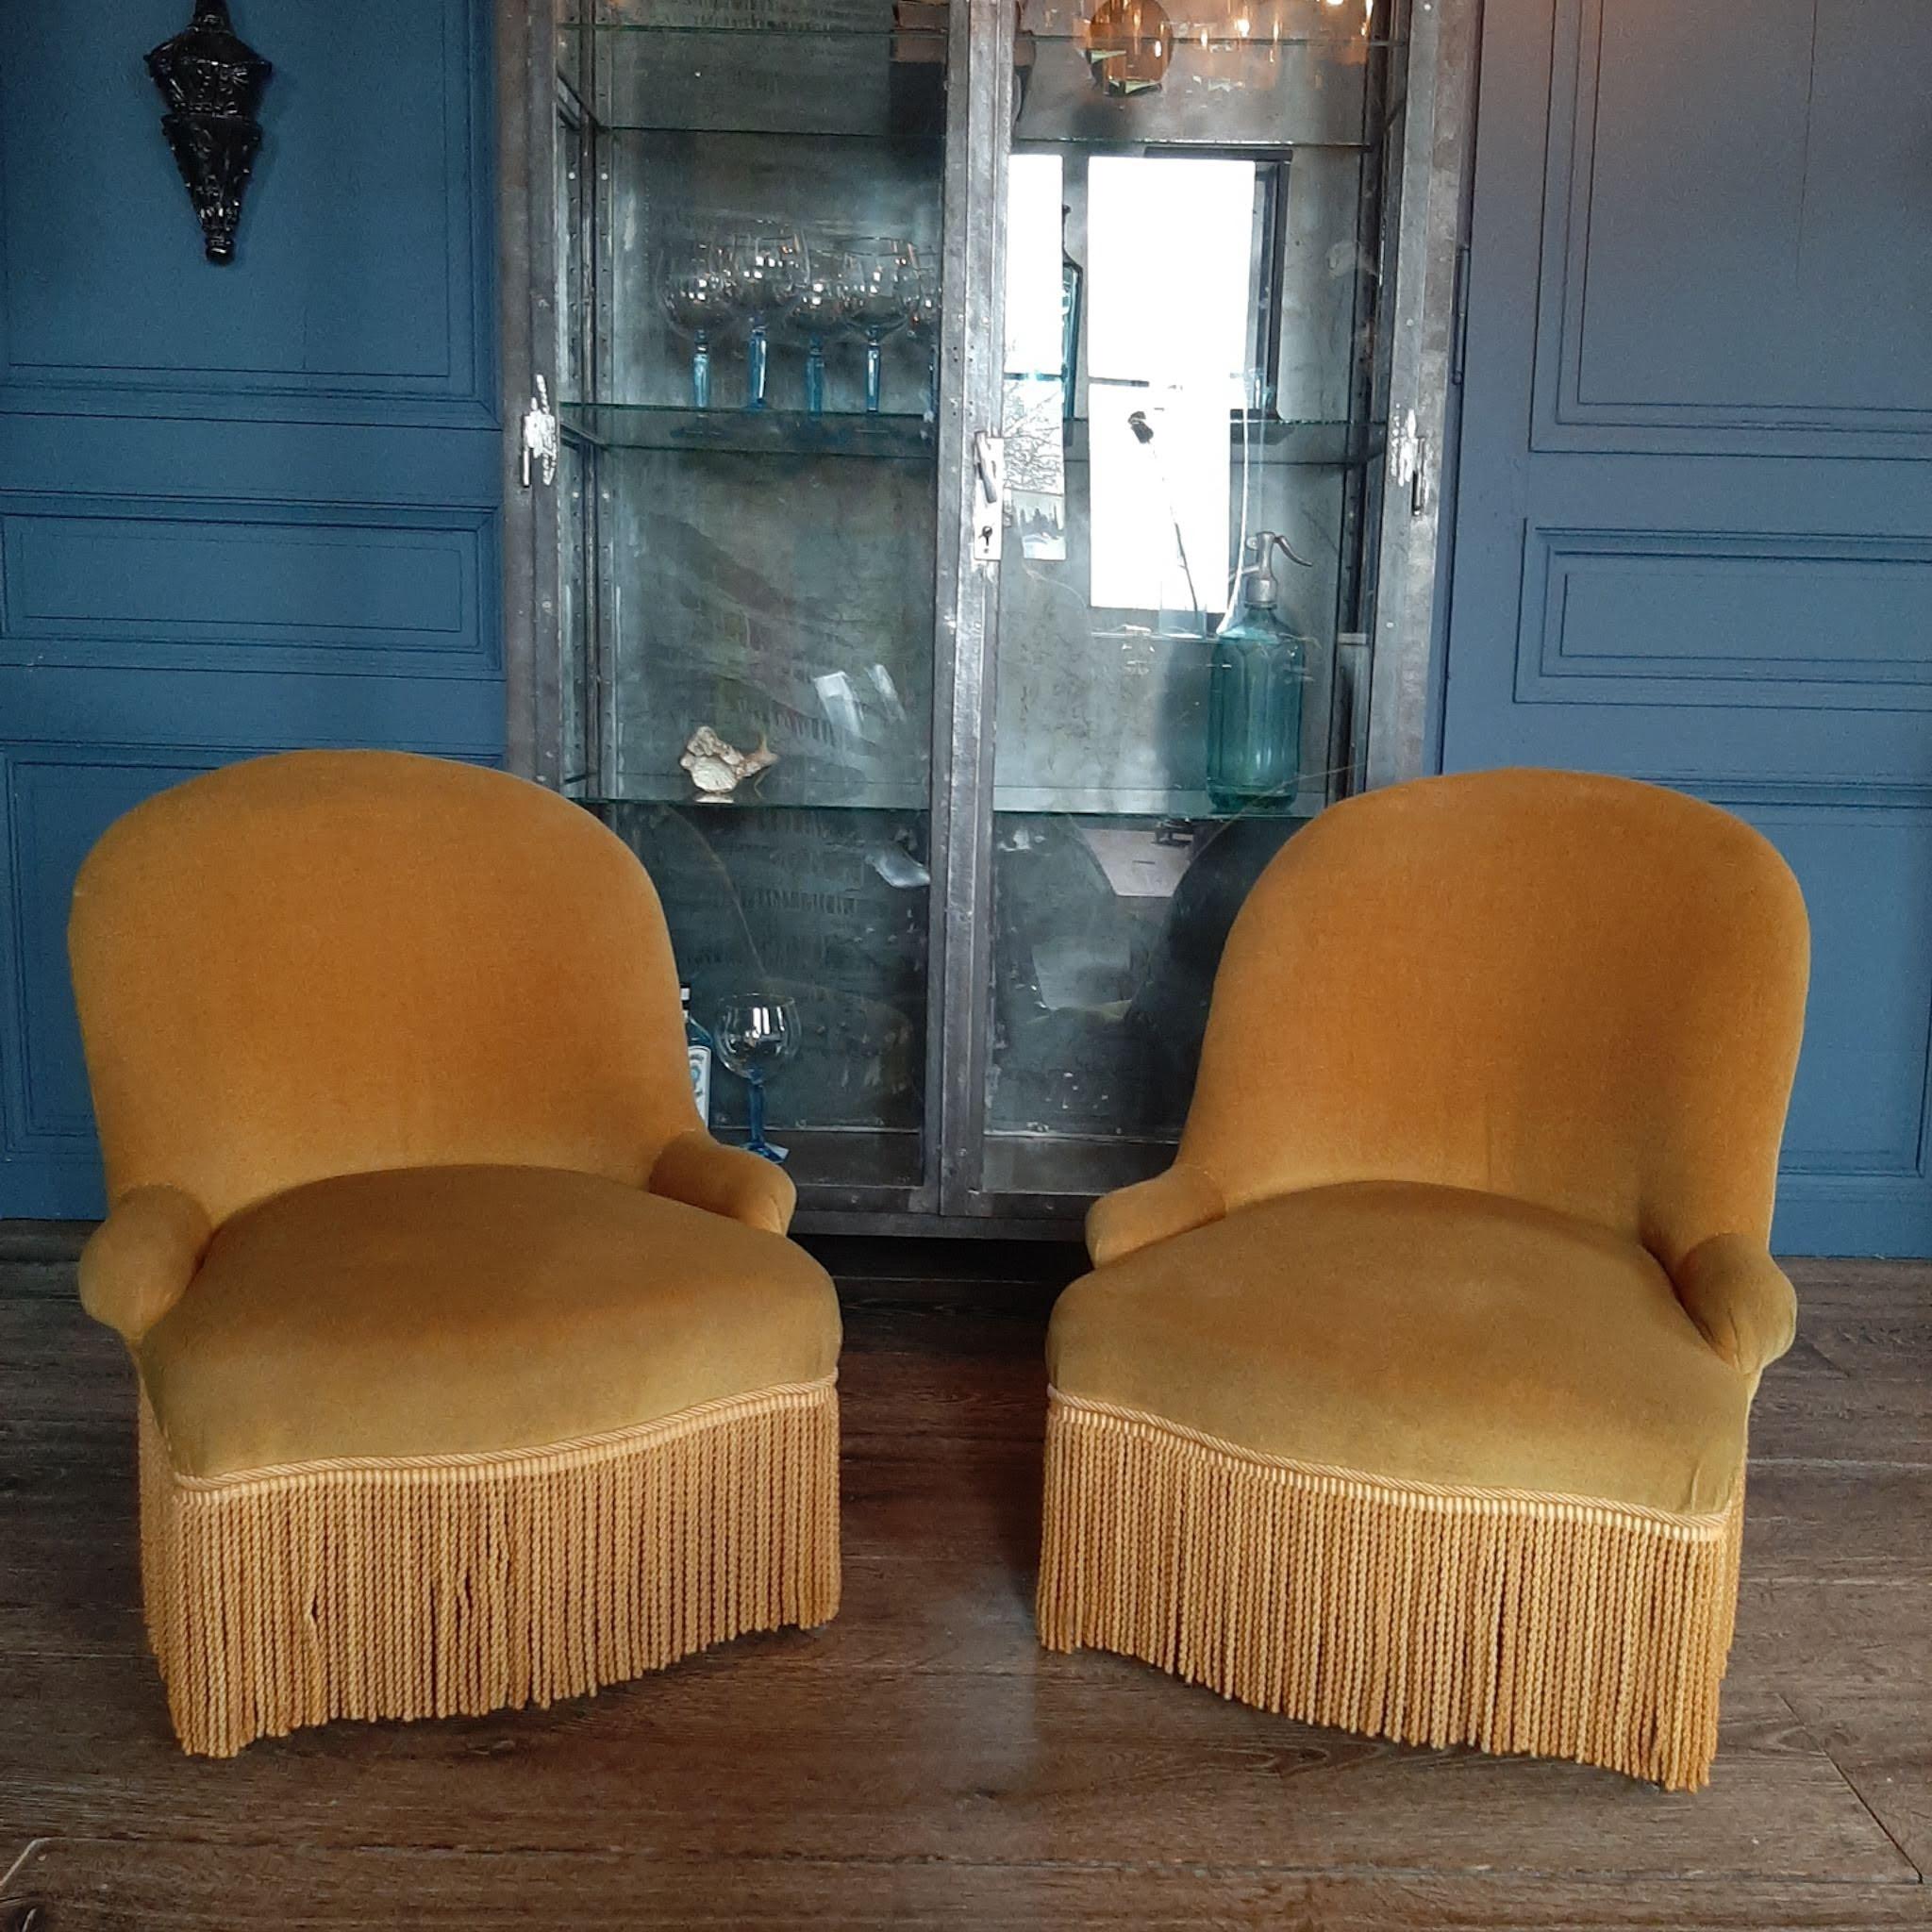 Stel gele fluwelen stoeltjes met franjes